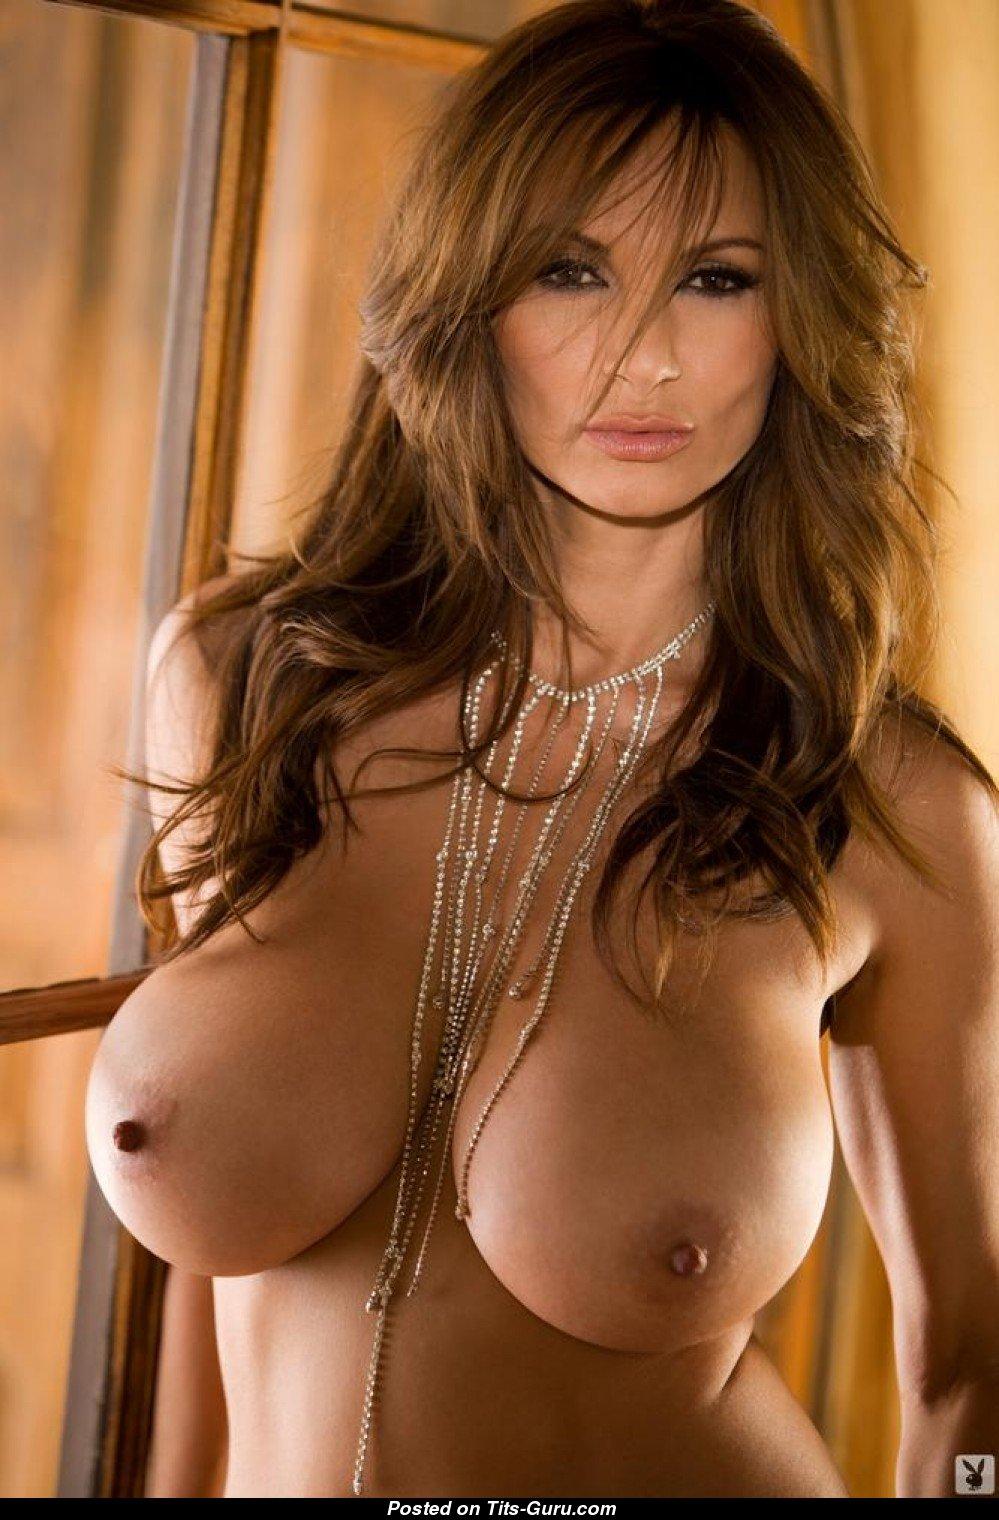 Big nipples naked